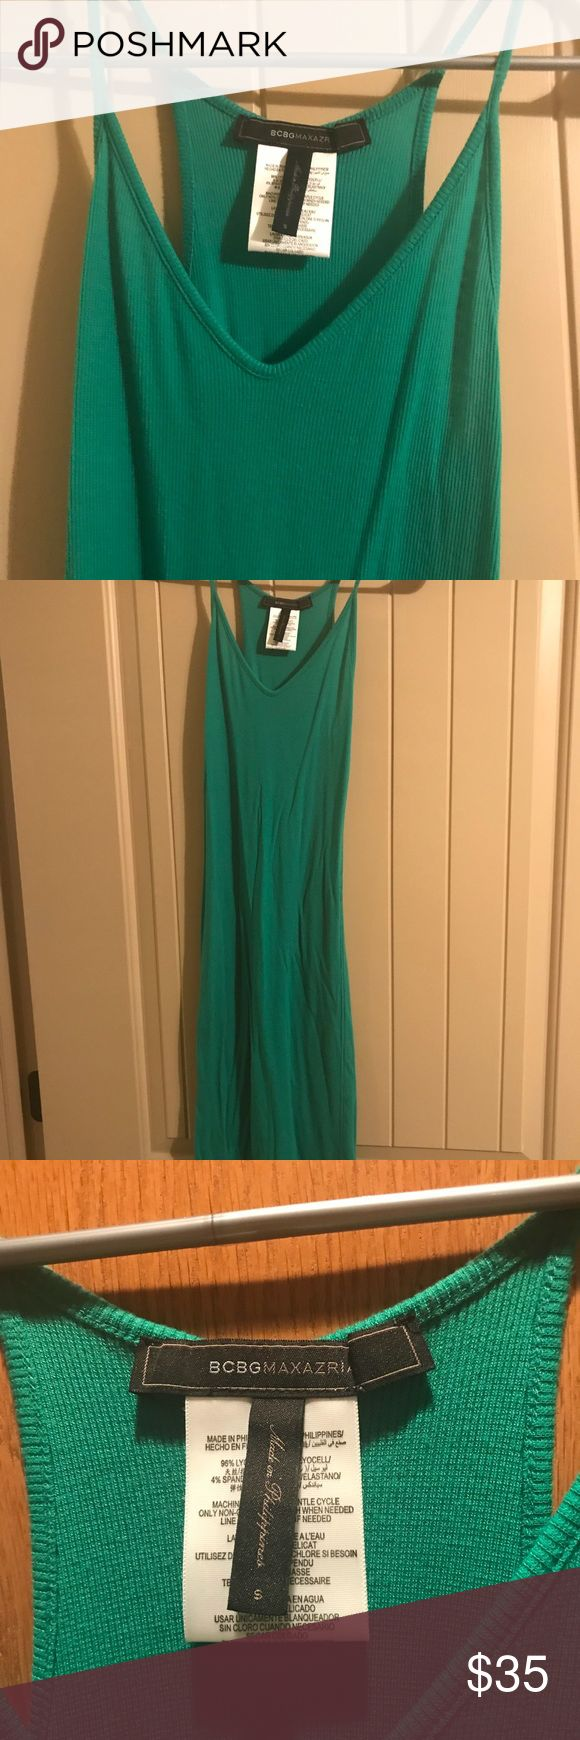 BCBG green bodycon dress Green small BCBG dress. Lightly worn. BCBG Dresses Midi